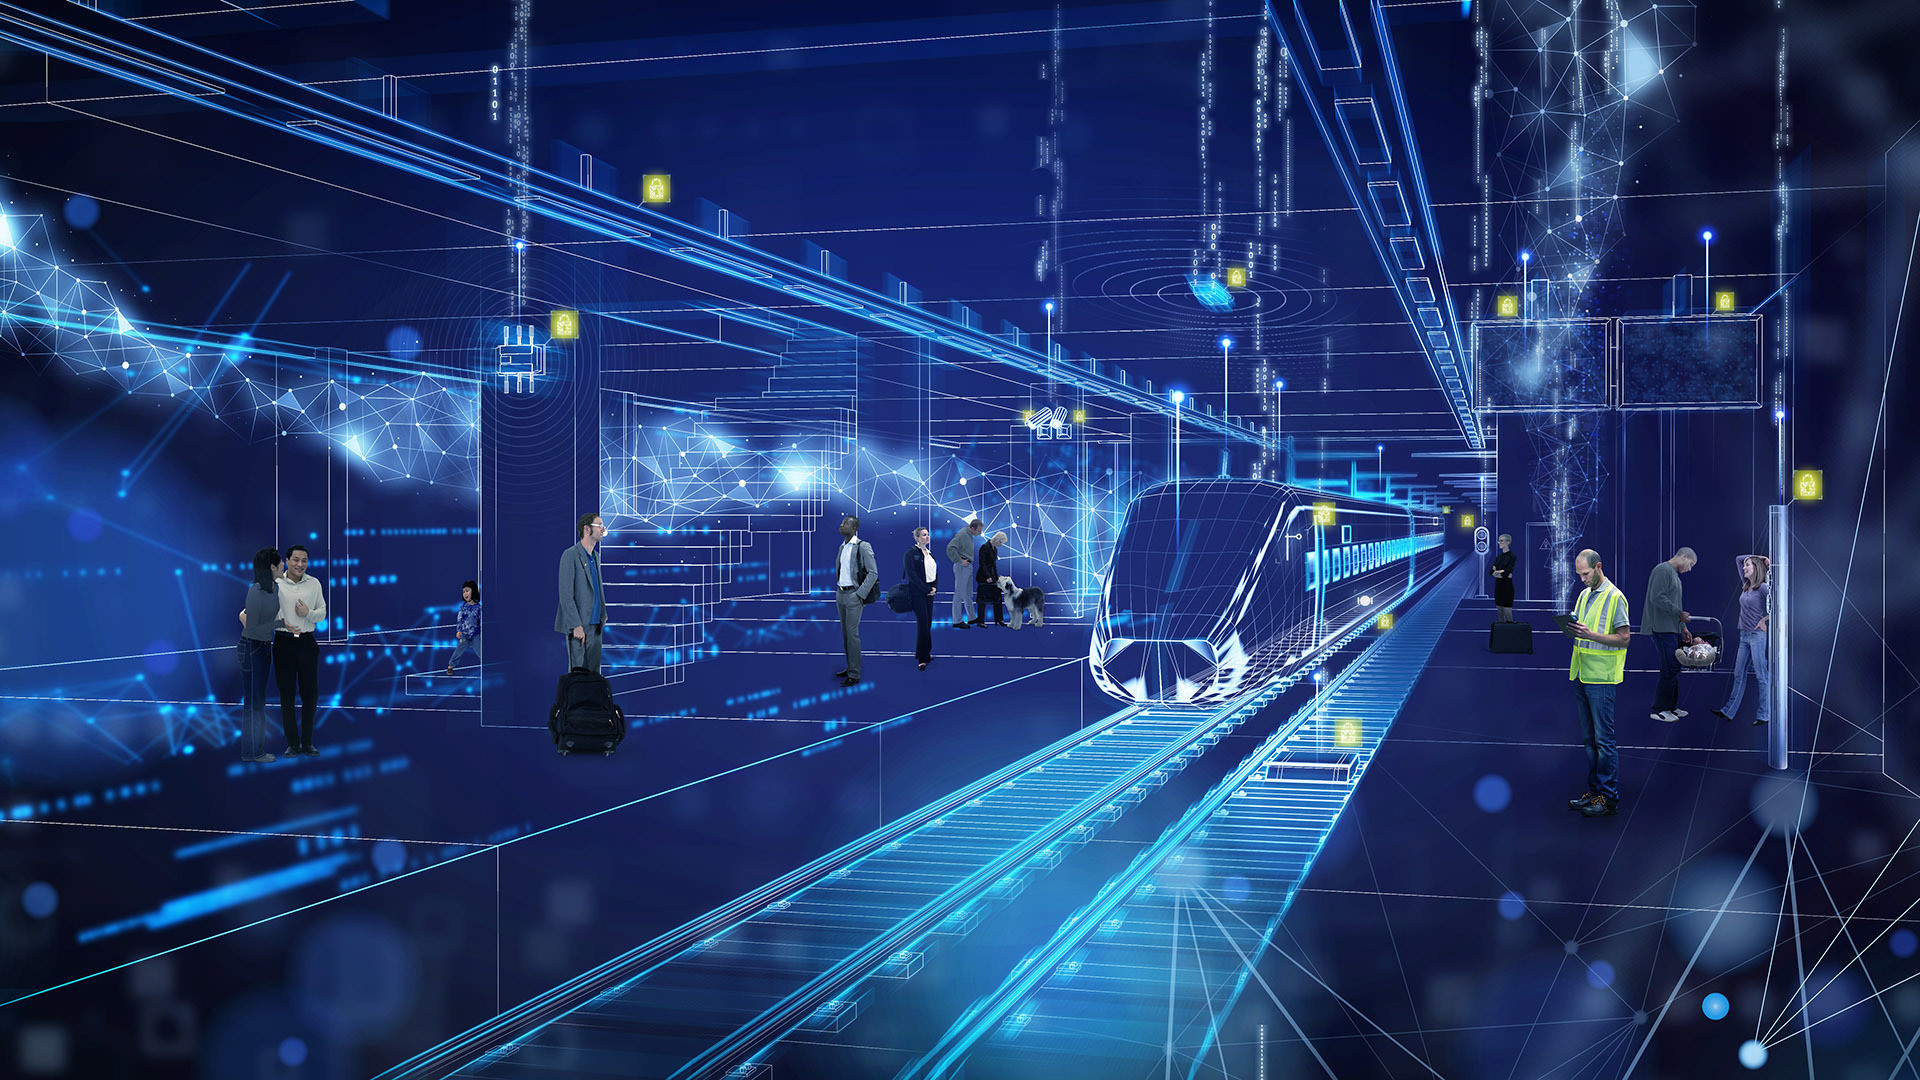 Representation of a digital subway.